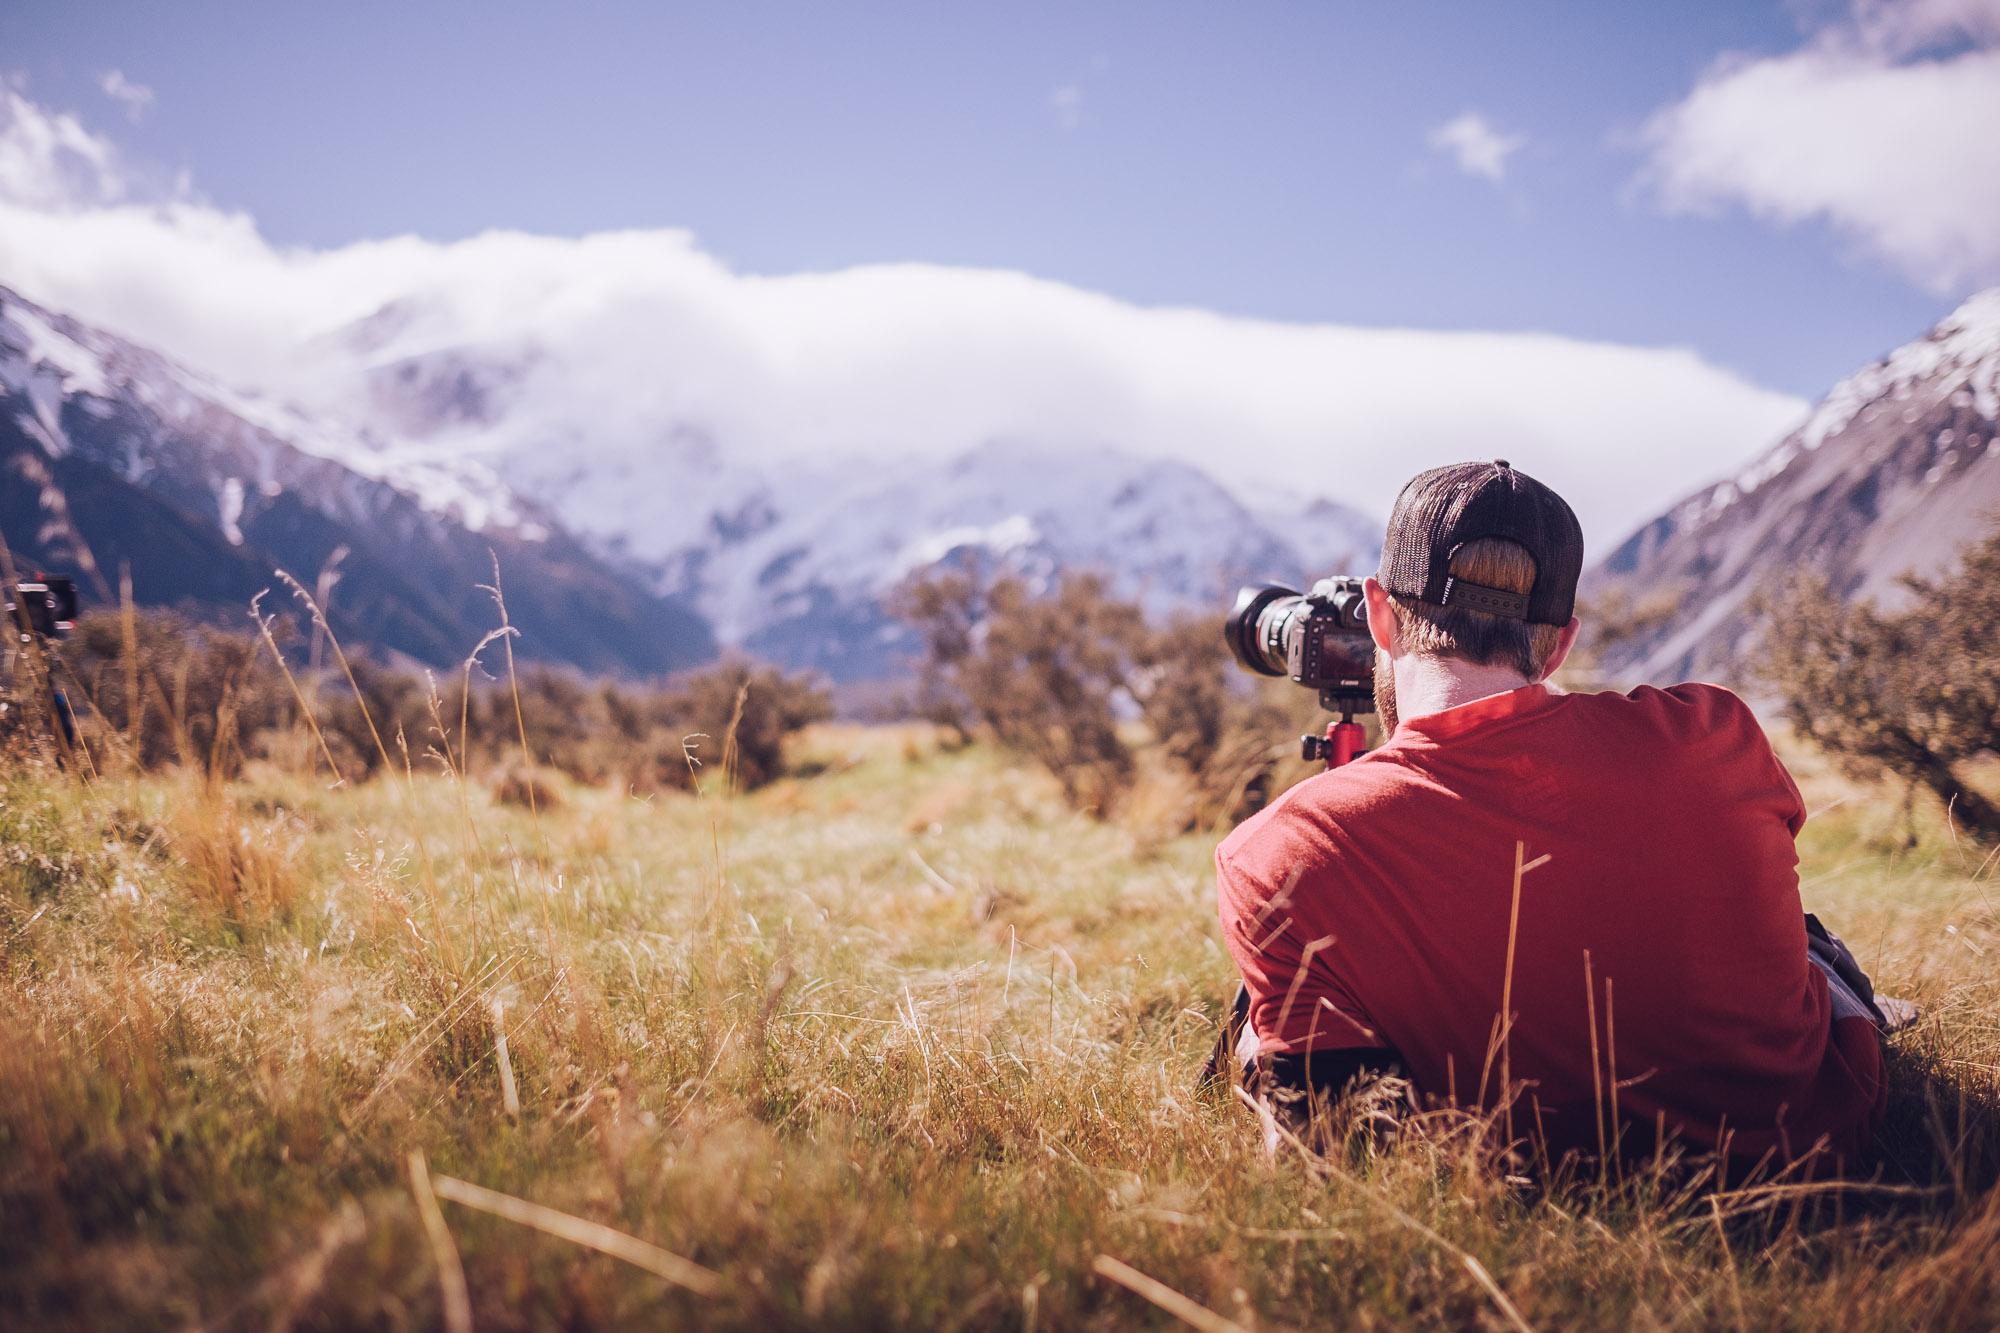 photography-workshop-new-zealand-2056.jpg